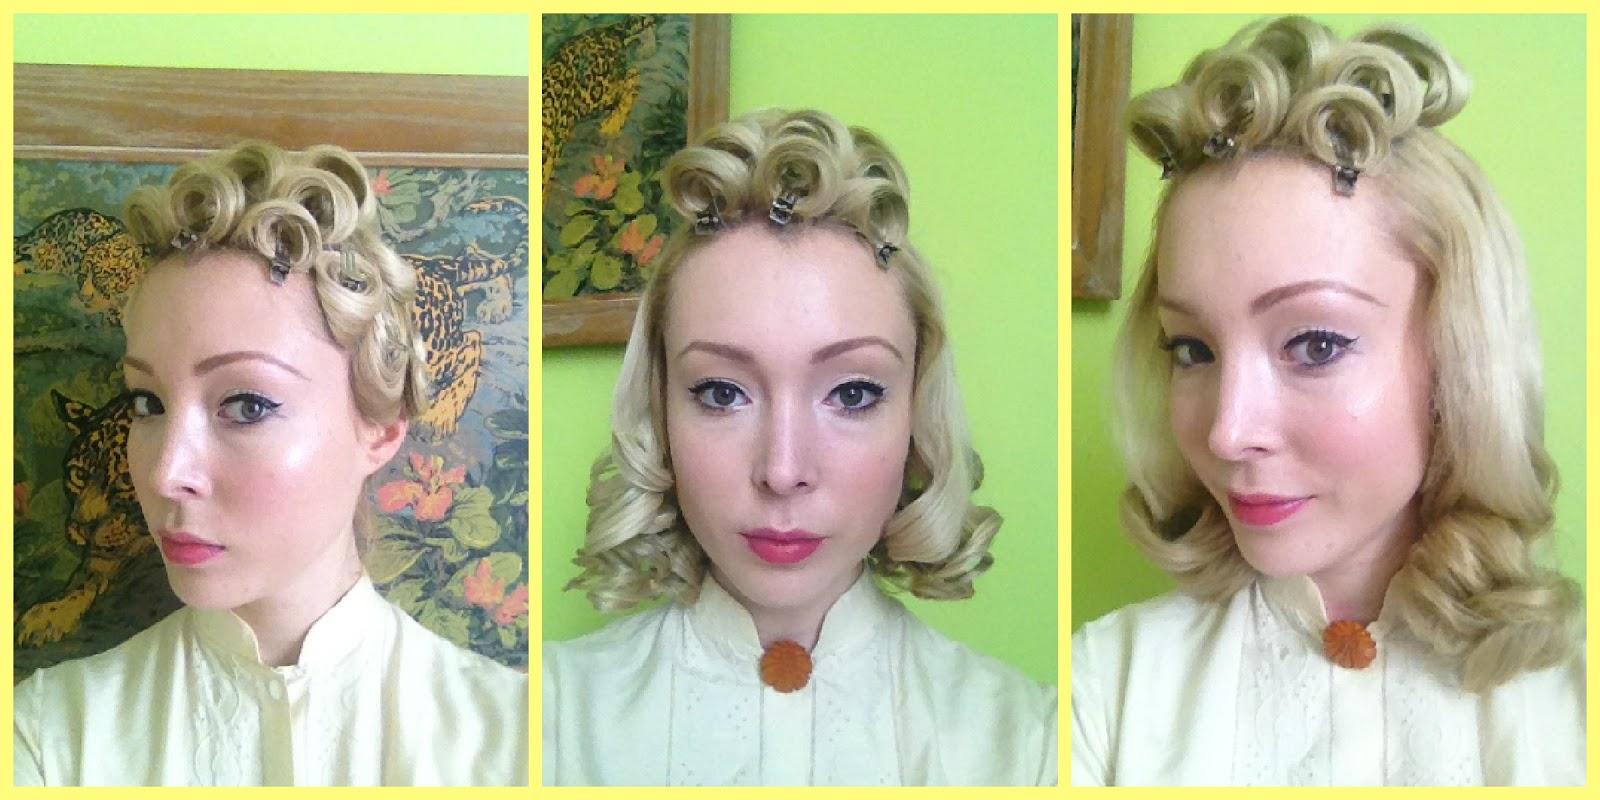 Astonishing The Vintage Minimalist Basic And Easy Pin Curl Set 1940S Short Hairstyles For Black Women Fulllsitofus